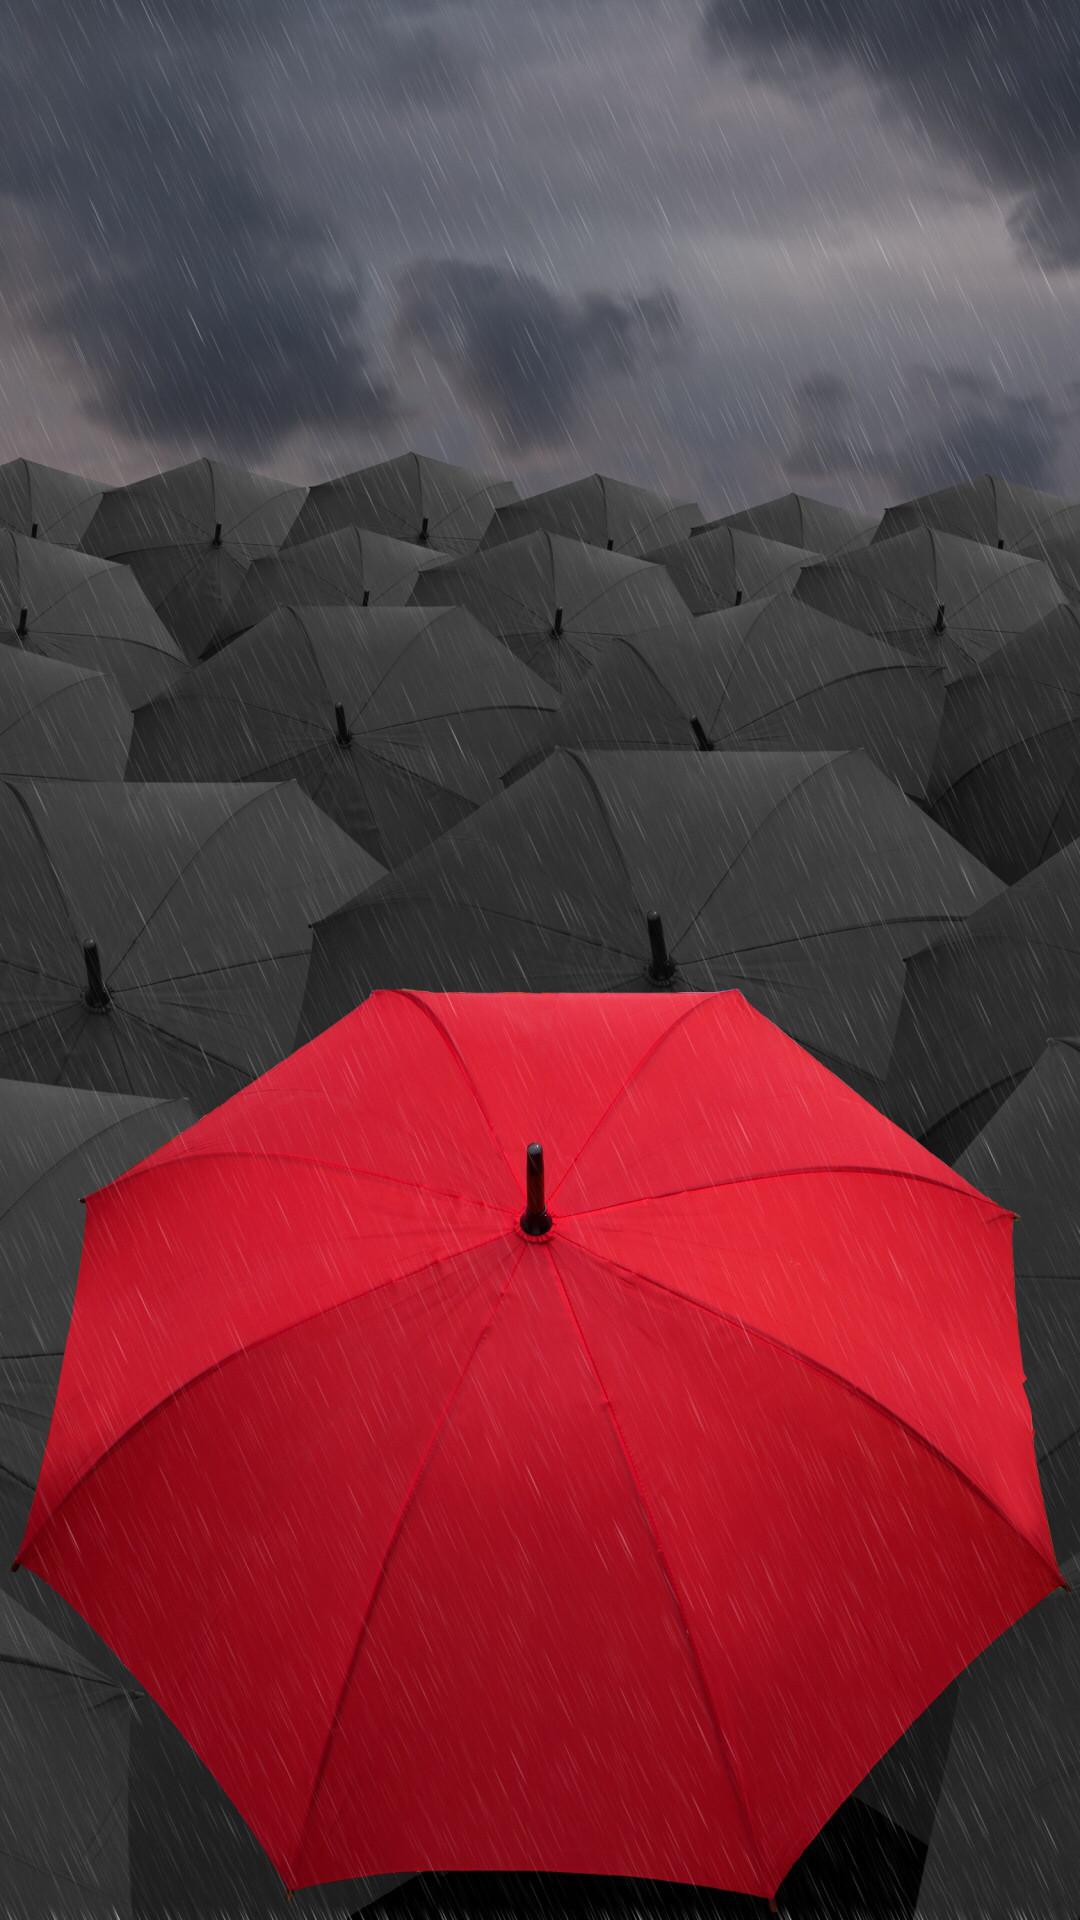 Umbrellas Rain Gray Red iPhone 6 Plus. Wallpapers …